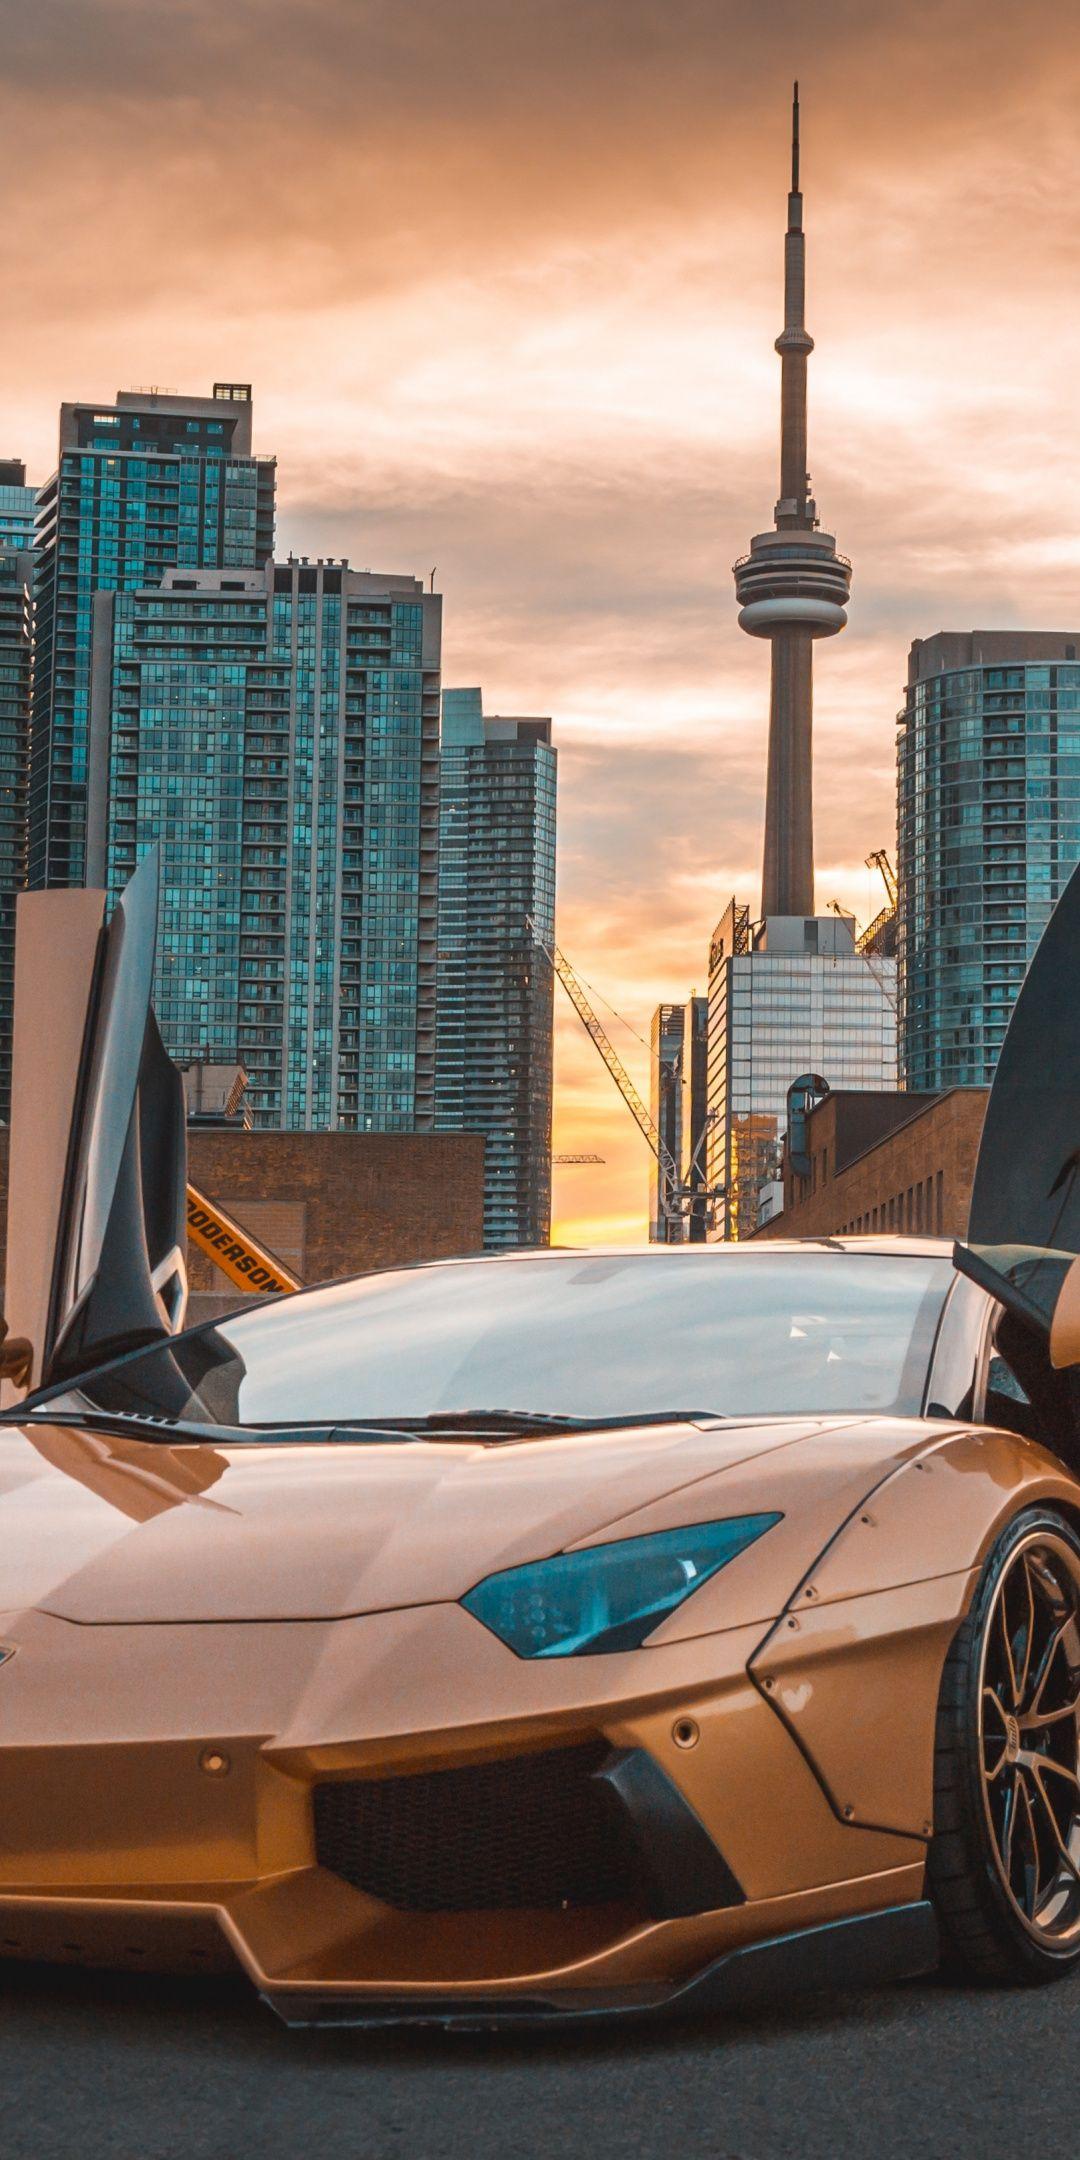 Golden Lamborghini Aventador, CN tower, 1080x2160 wallpaper is part of Luxury cars audi -